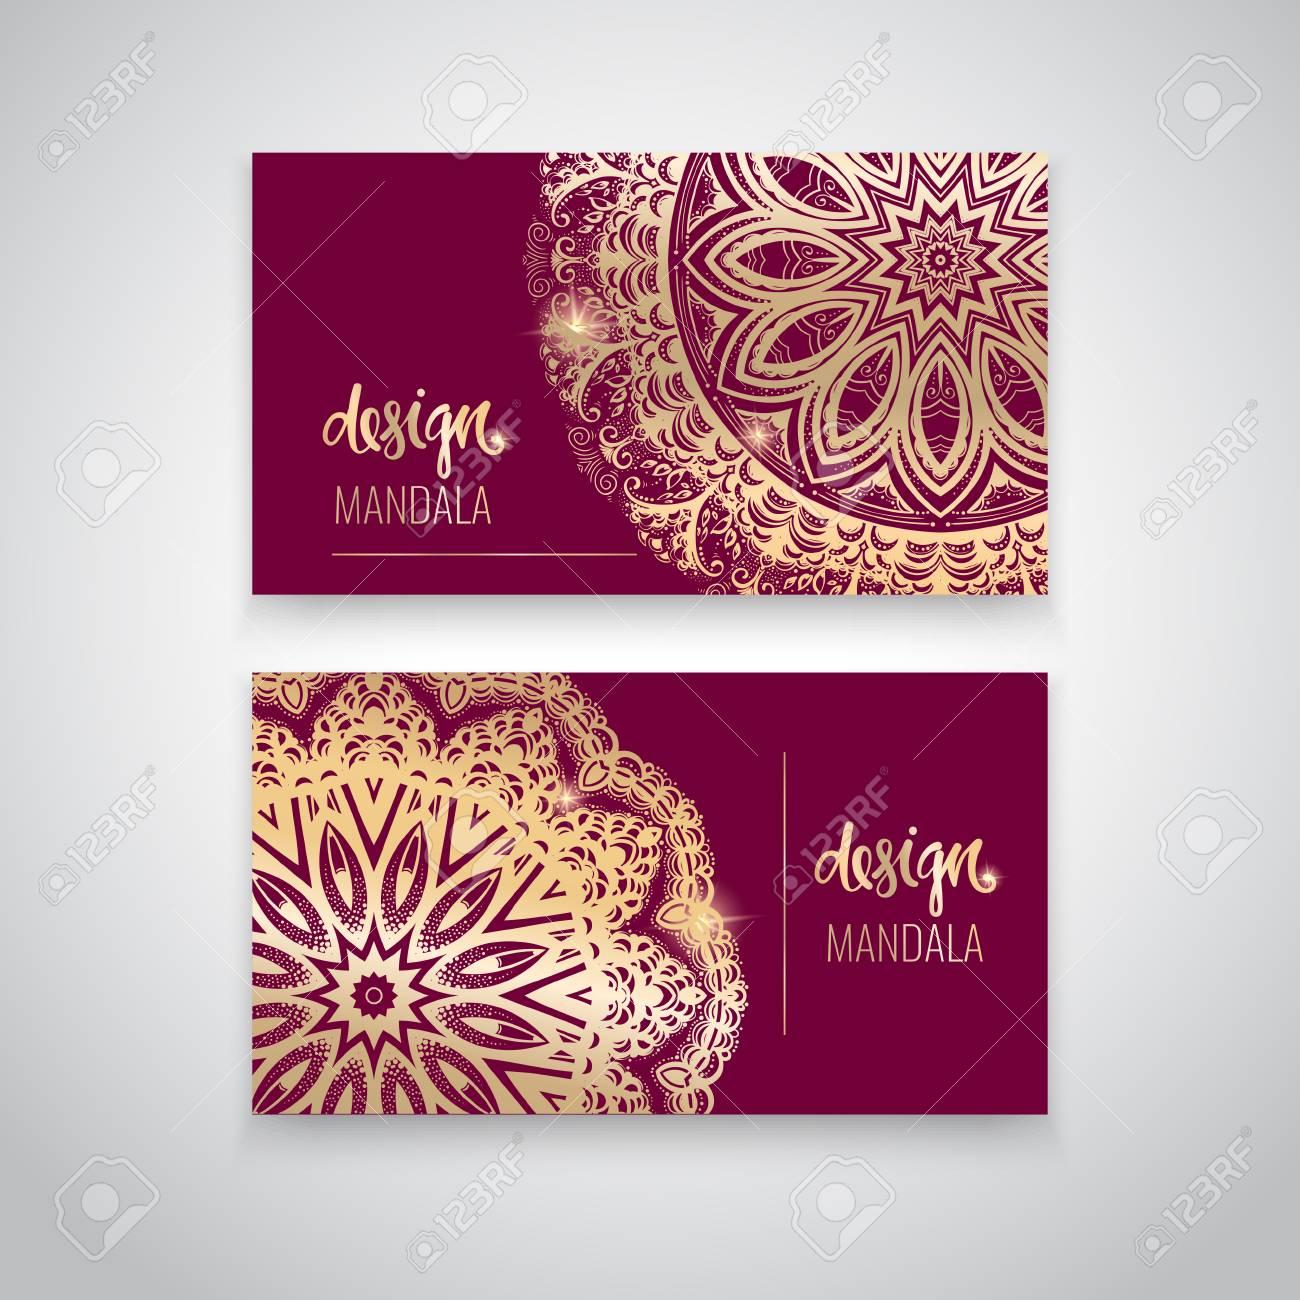 Plantilla Moderna Para El Diseo Mandala India Hermosa Del Modelo